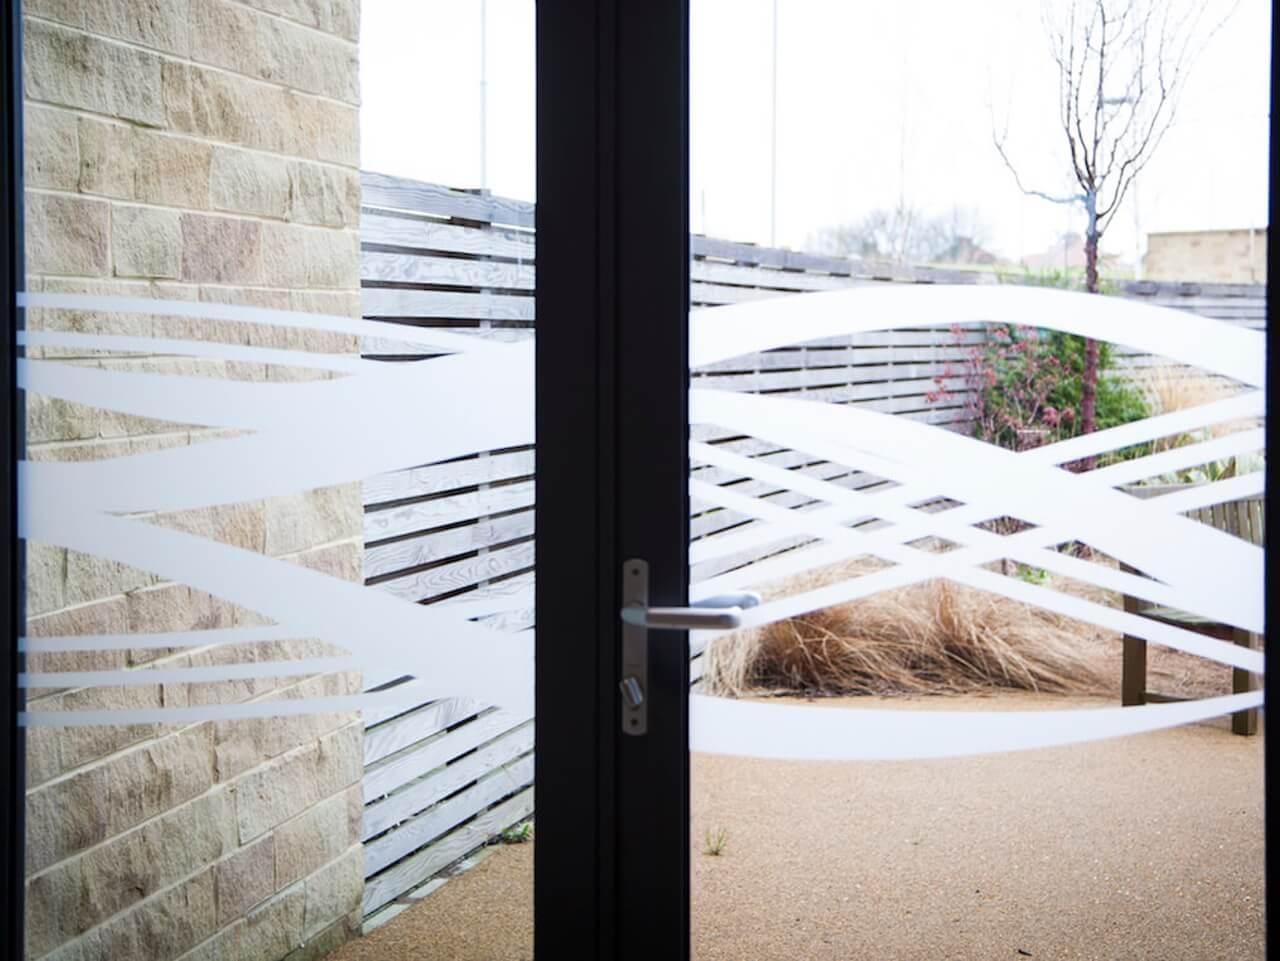 Detail of wave motif window manifestation across opening doors to garden